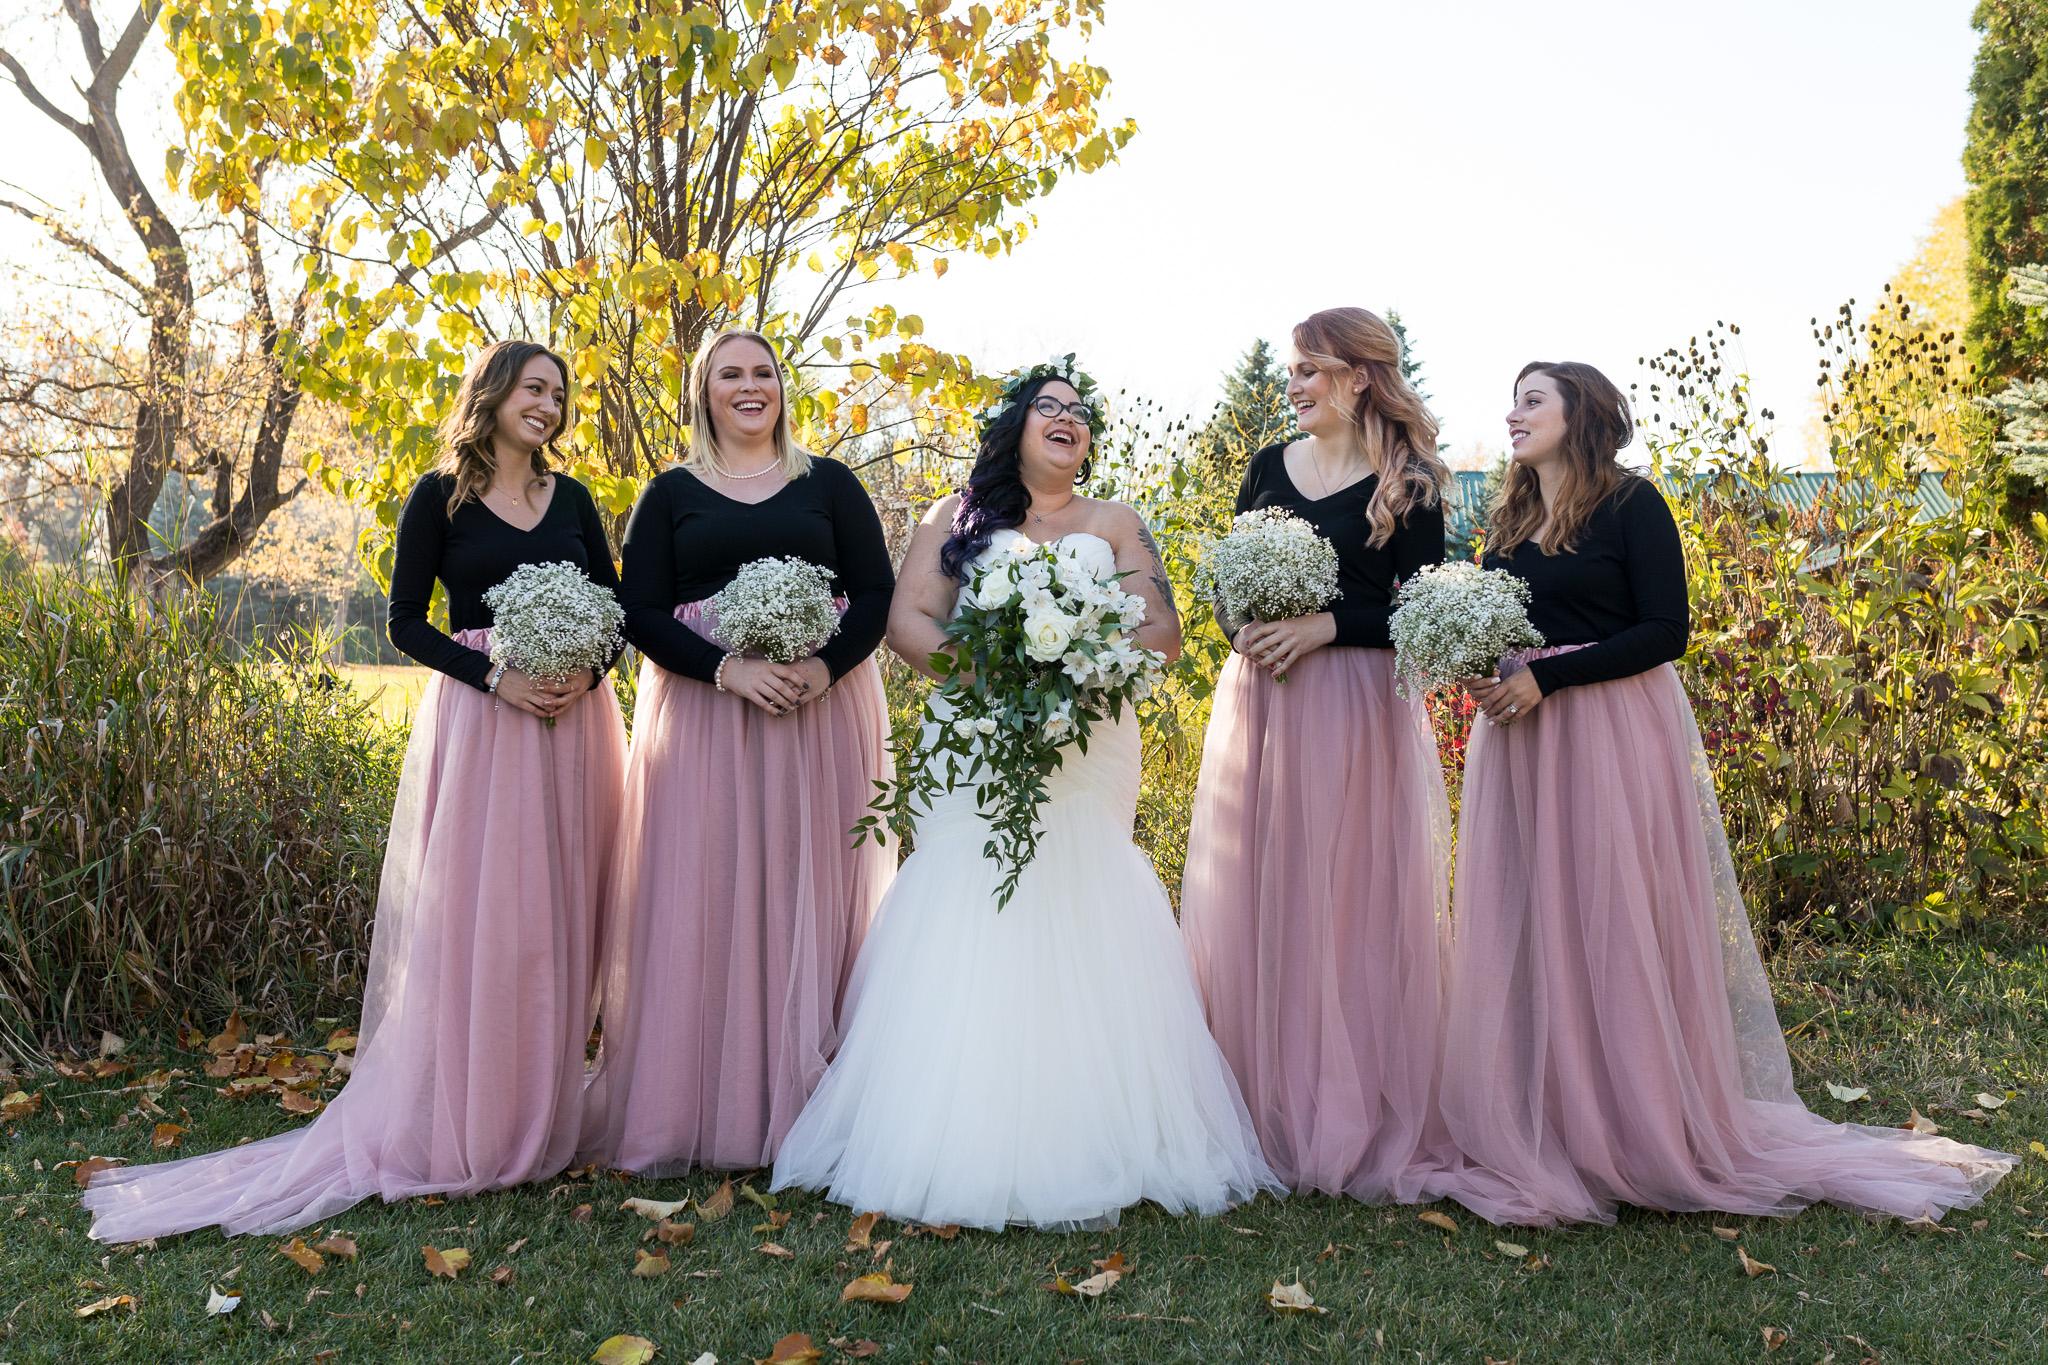 evergreen-village-winnipeg-wedding-32.jpg